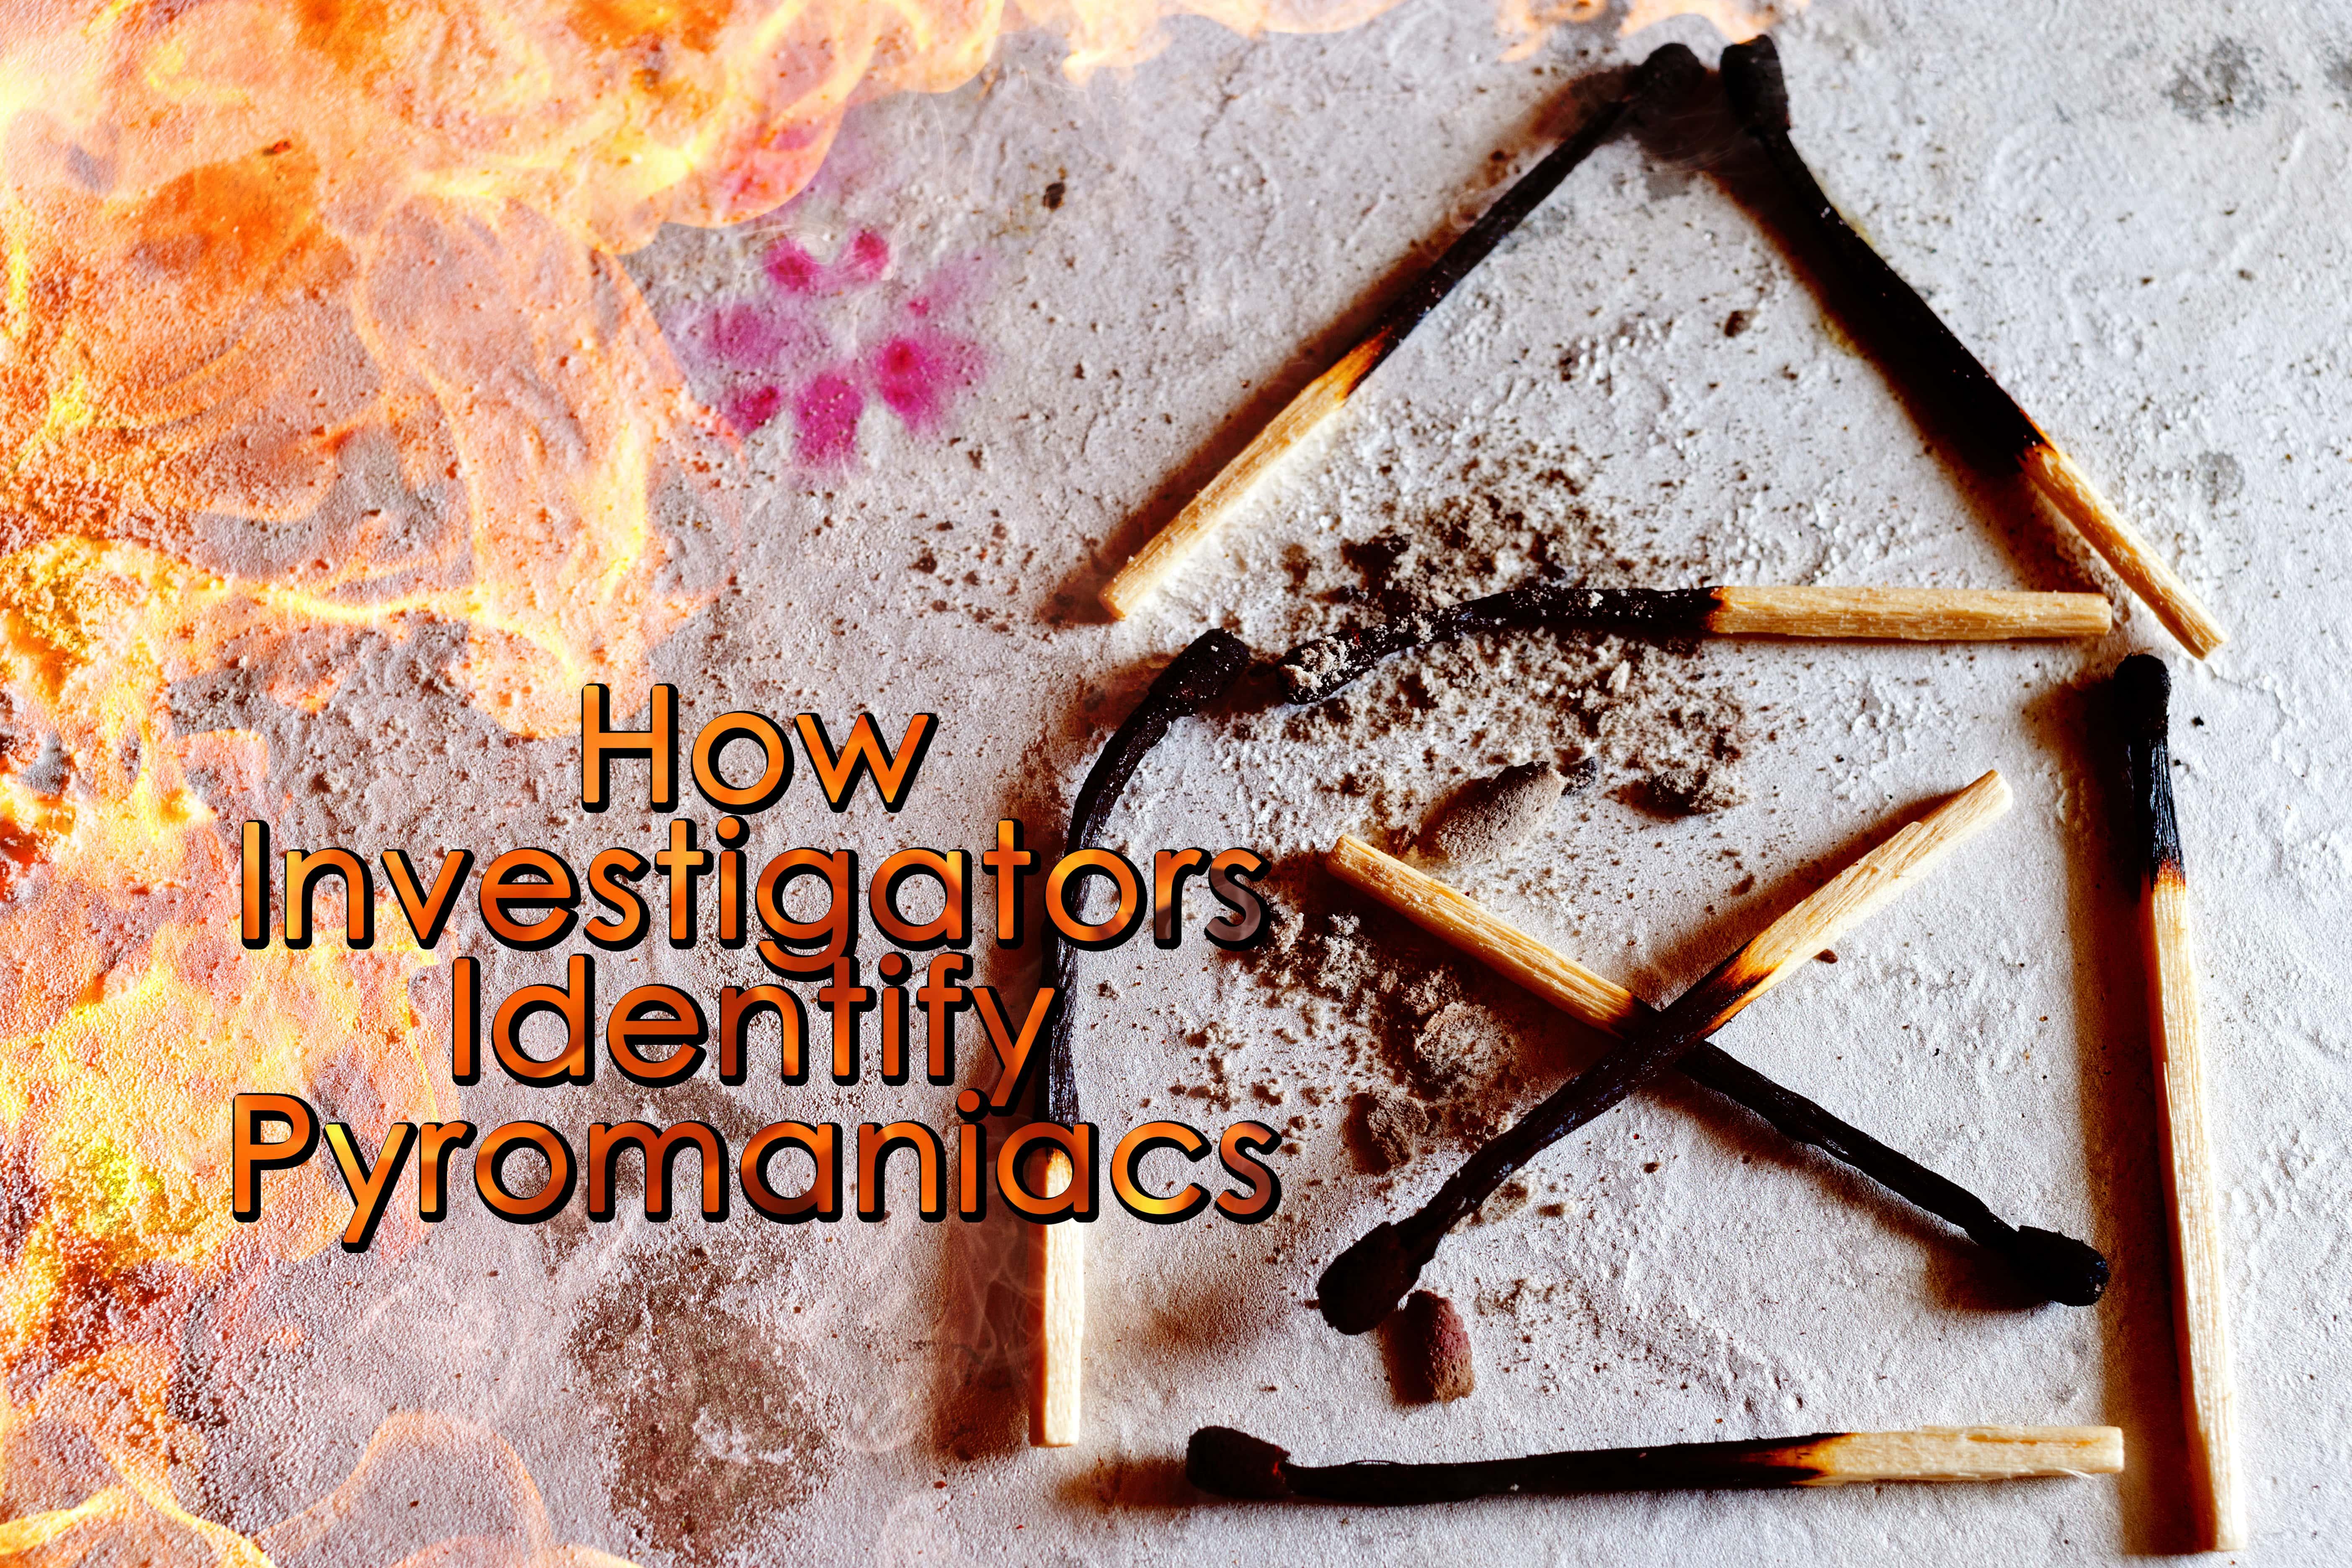 How Investigators Identify Pyromaniacs